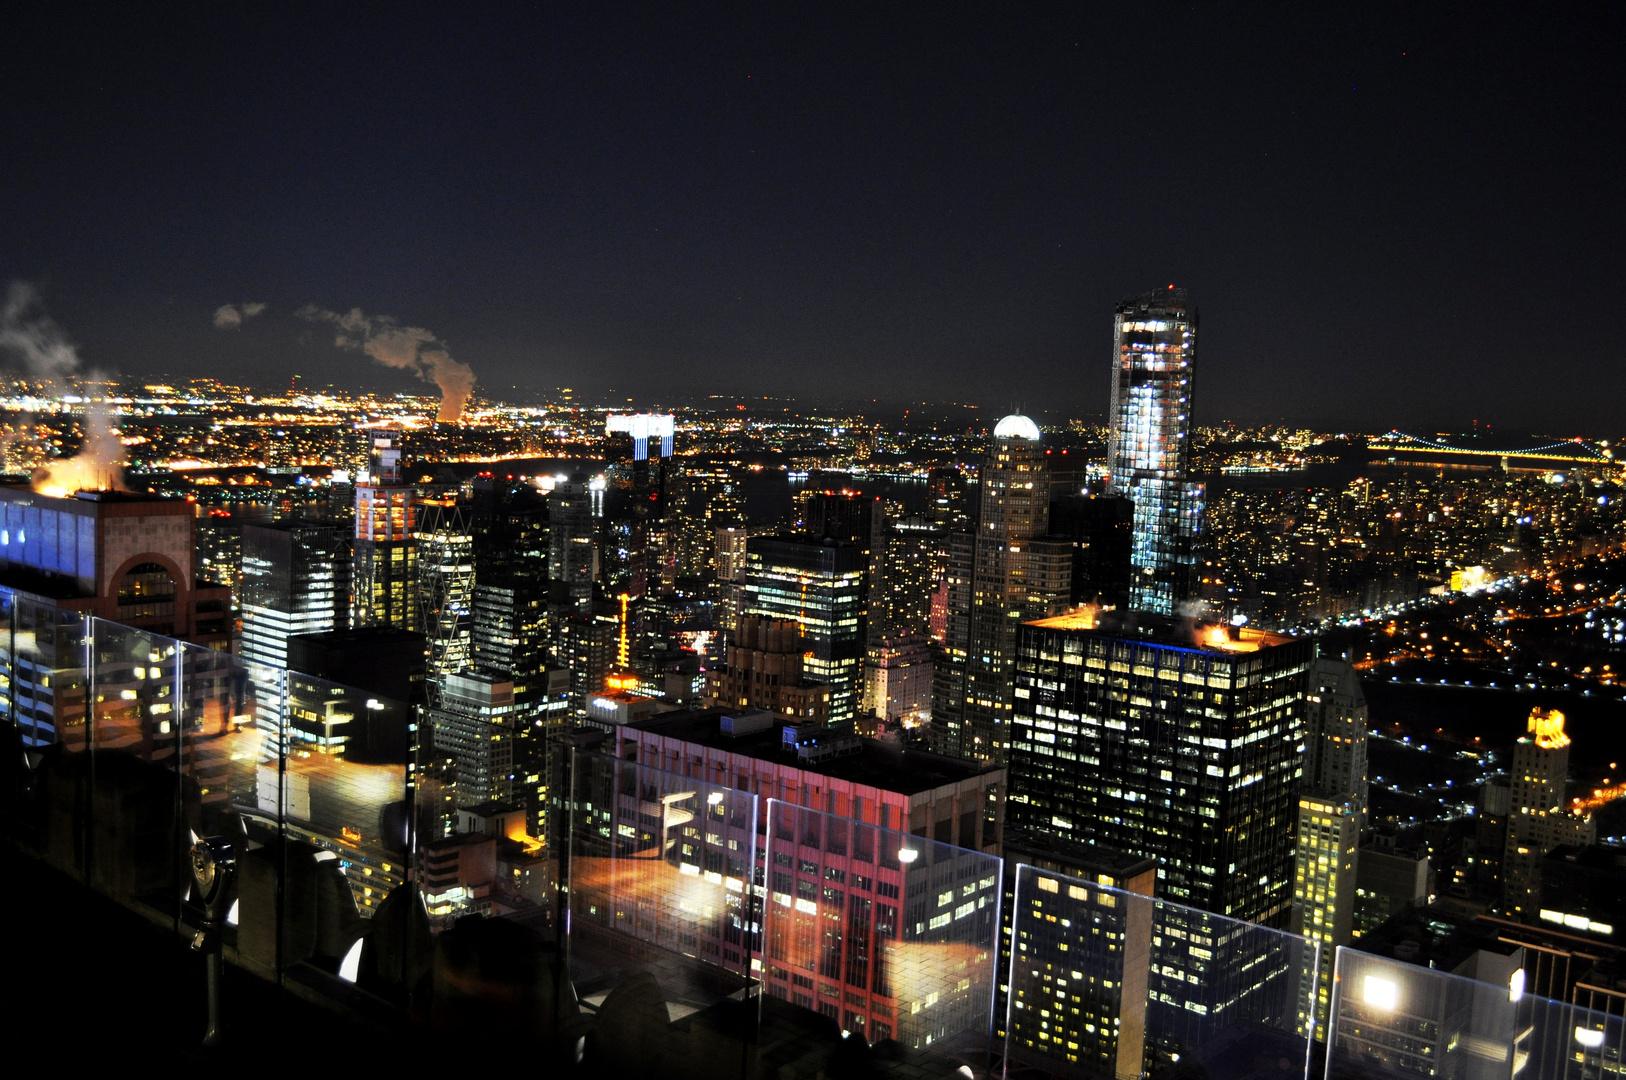 New York City - Manhatten - Rockefeller Center - Top Of The Rock